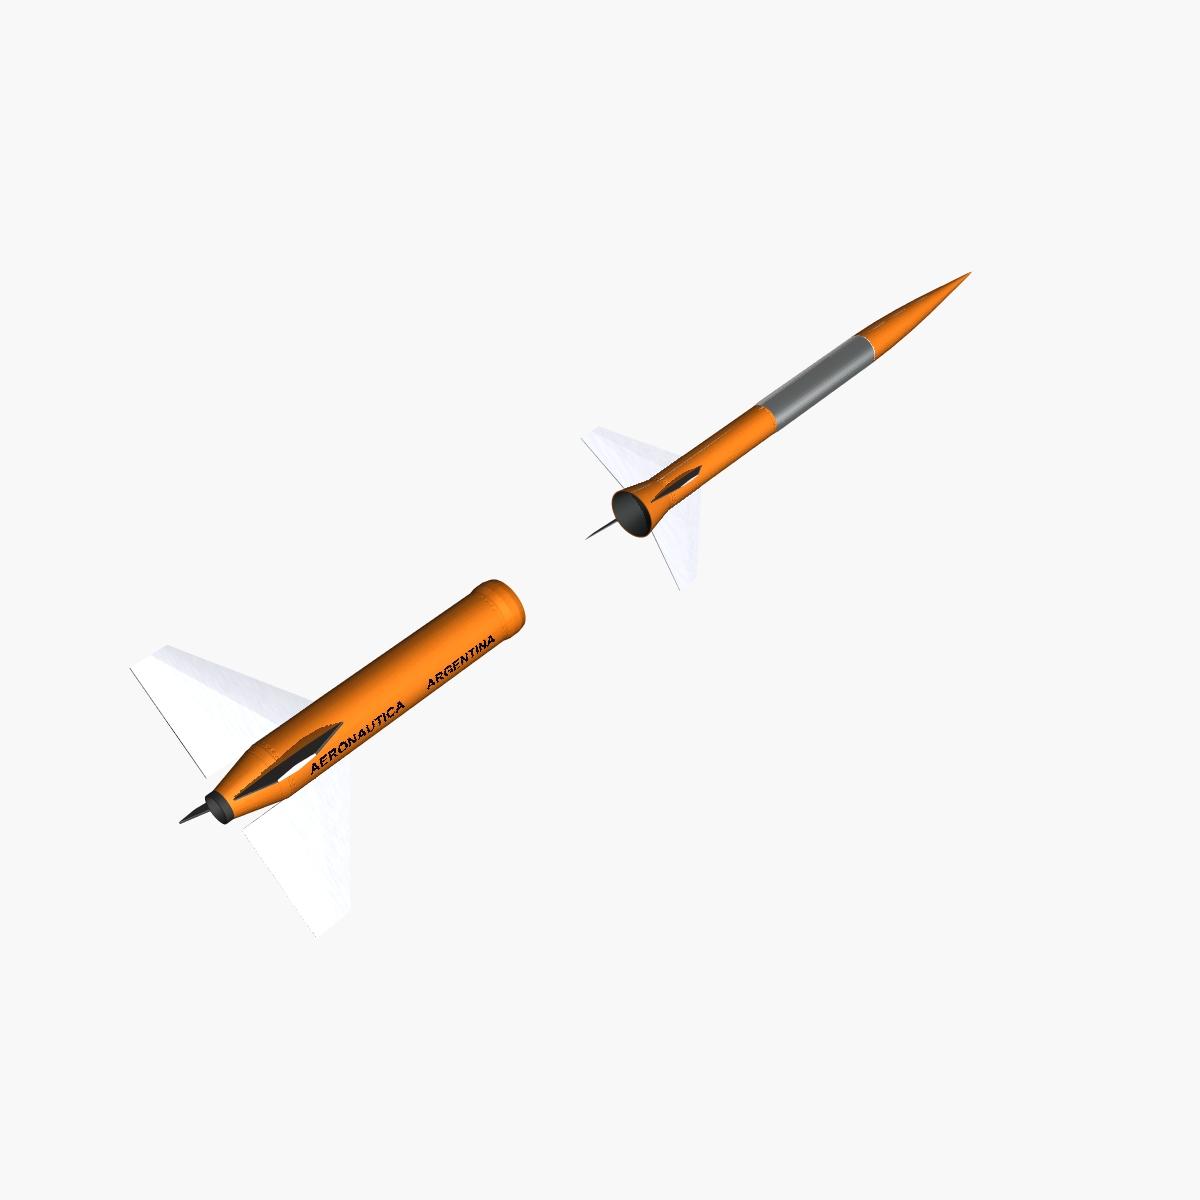 gamma centauro rocket 3d model 3ds dxf fbx blend cob dae x obj 218202